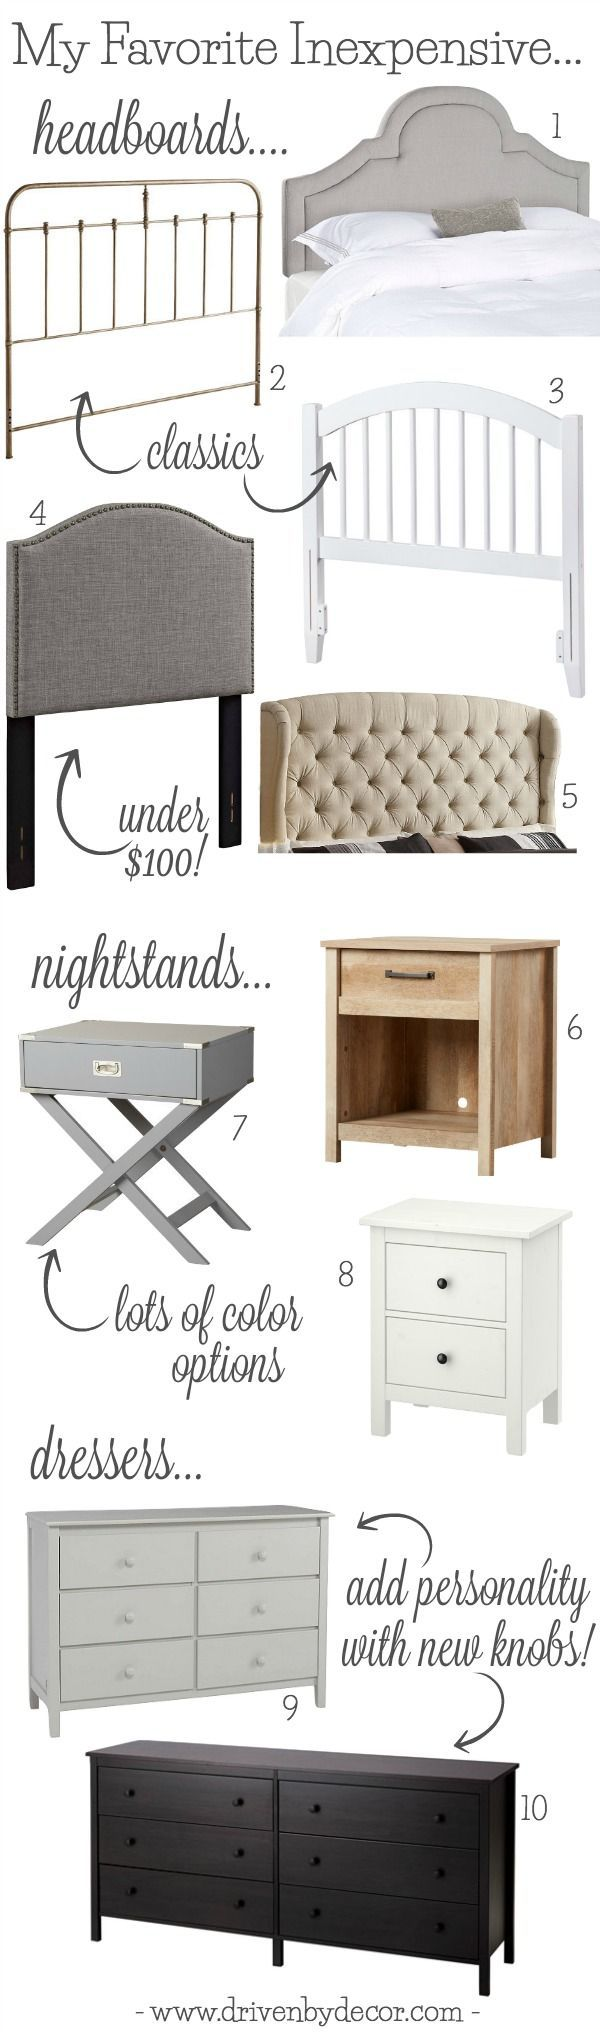 best master bedroom images on pinterest home room and diy